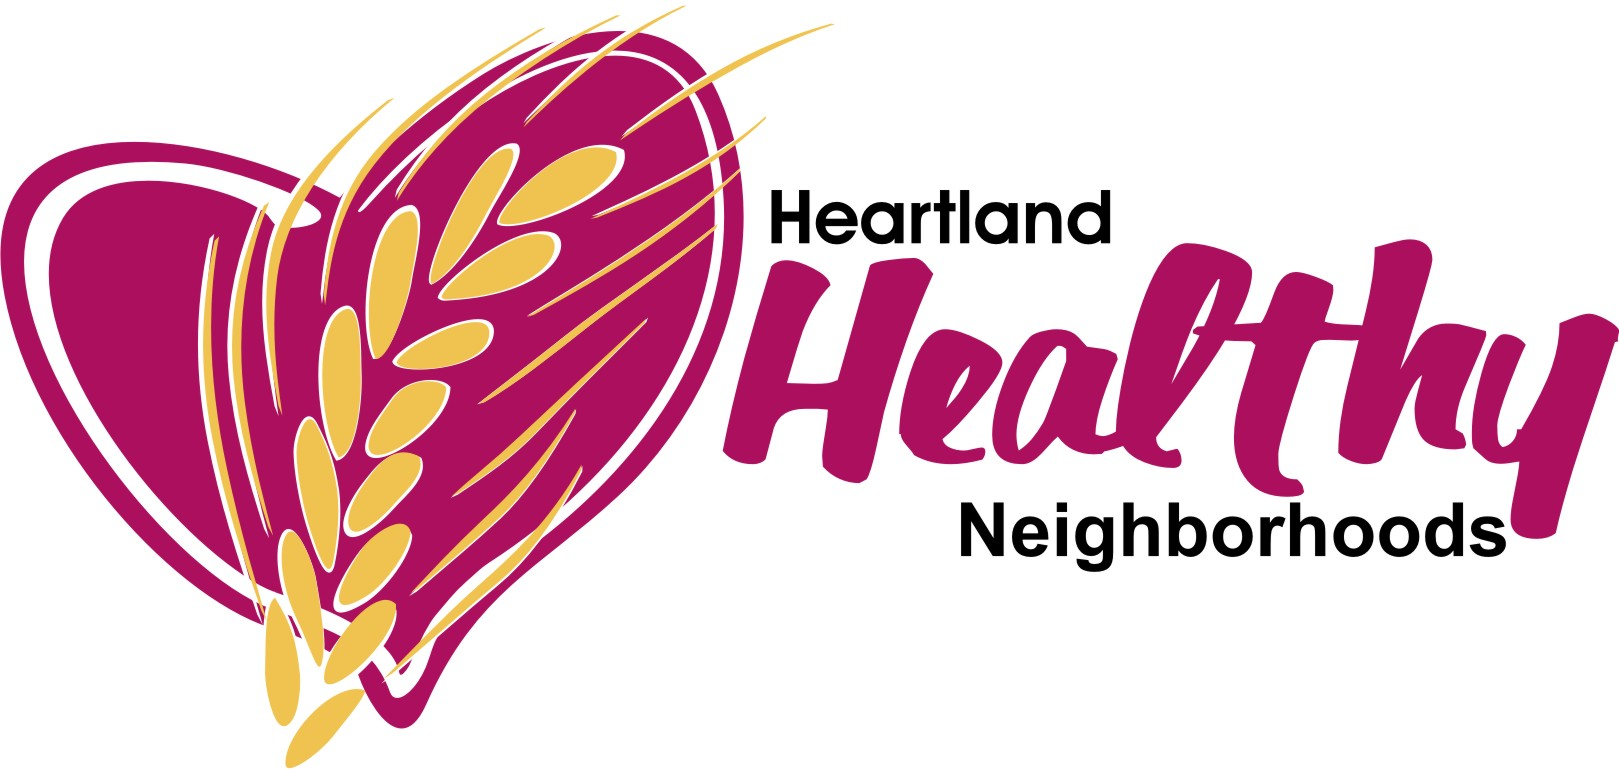 Logos - Heart_Wheat_Red